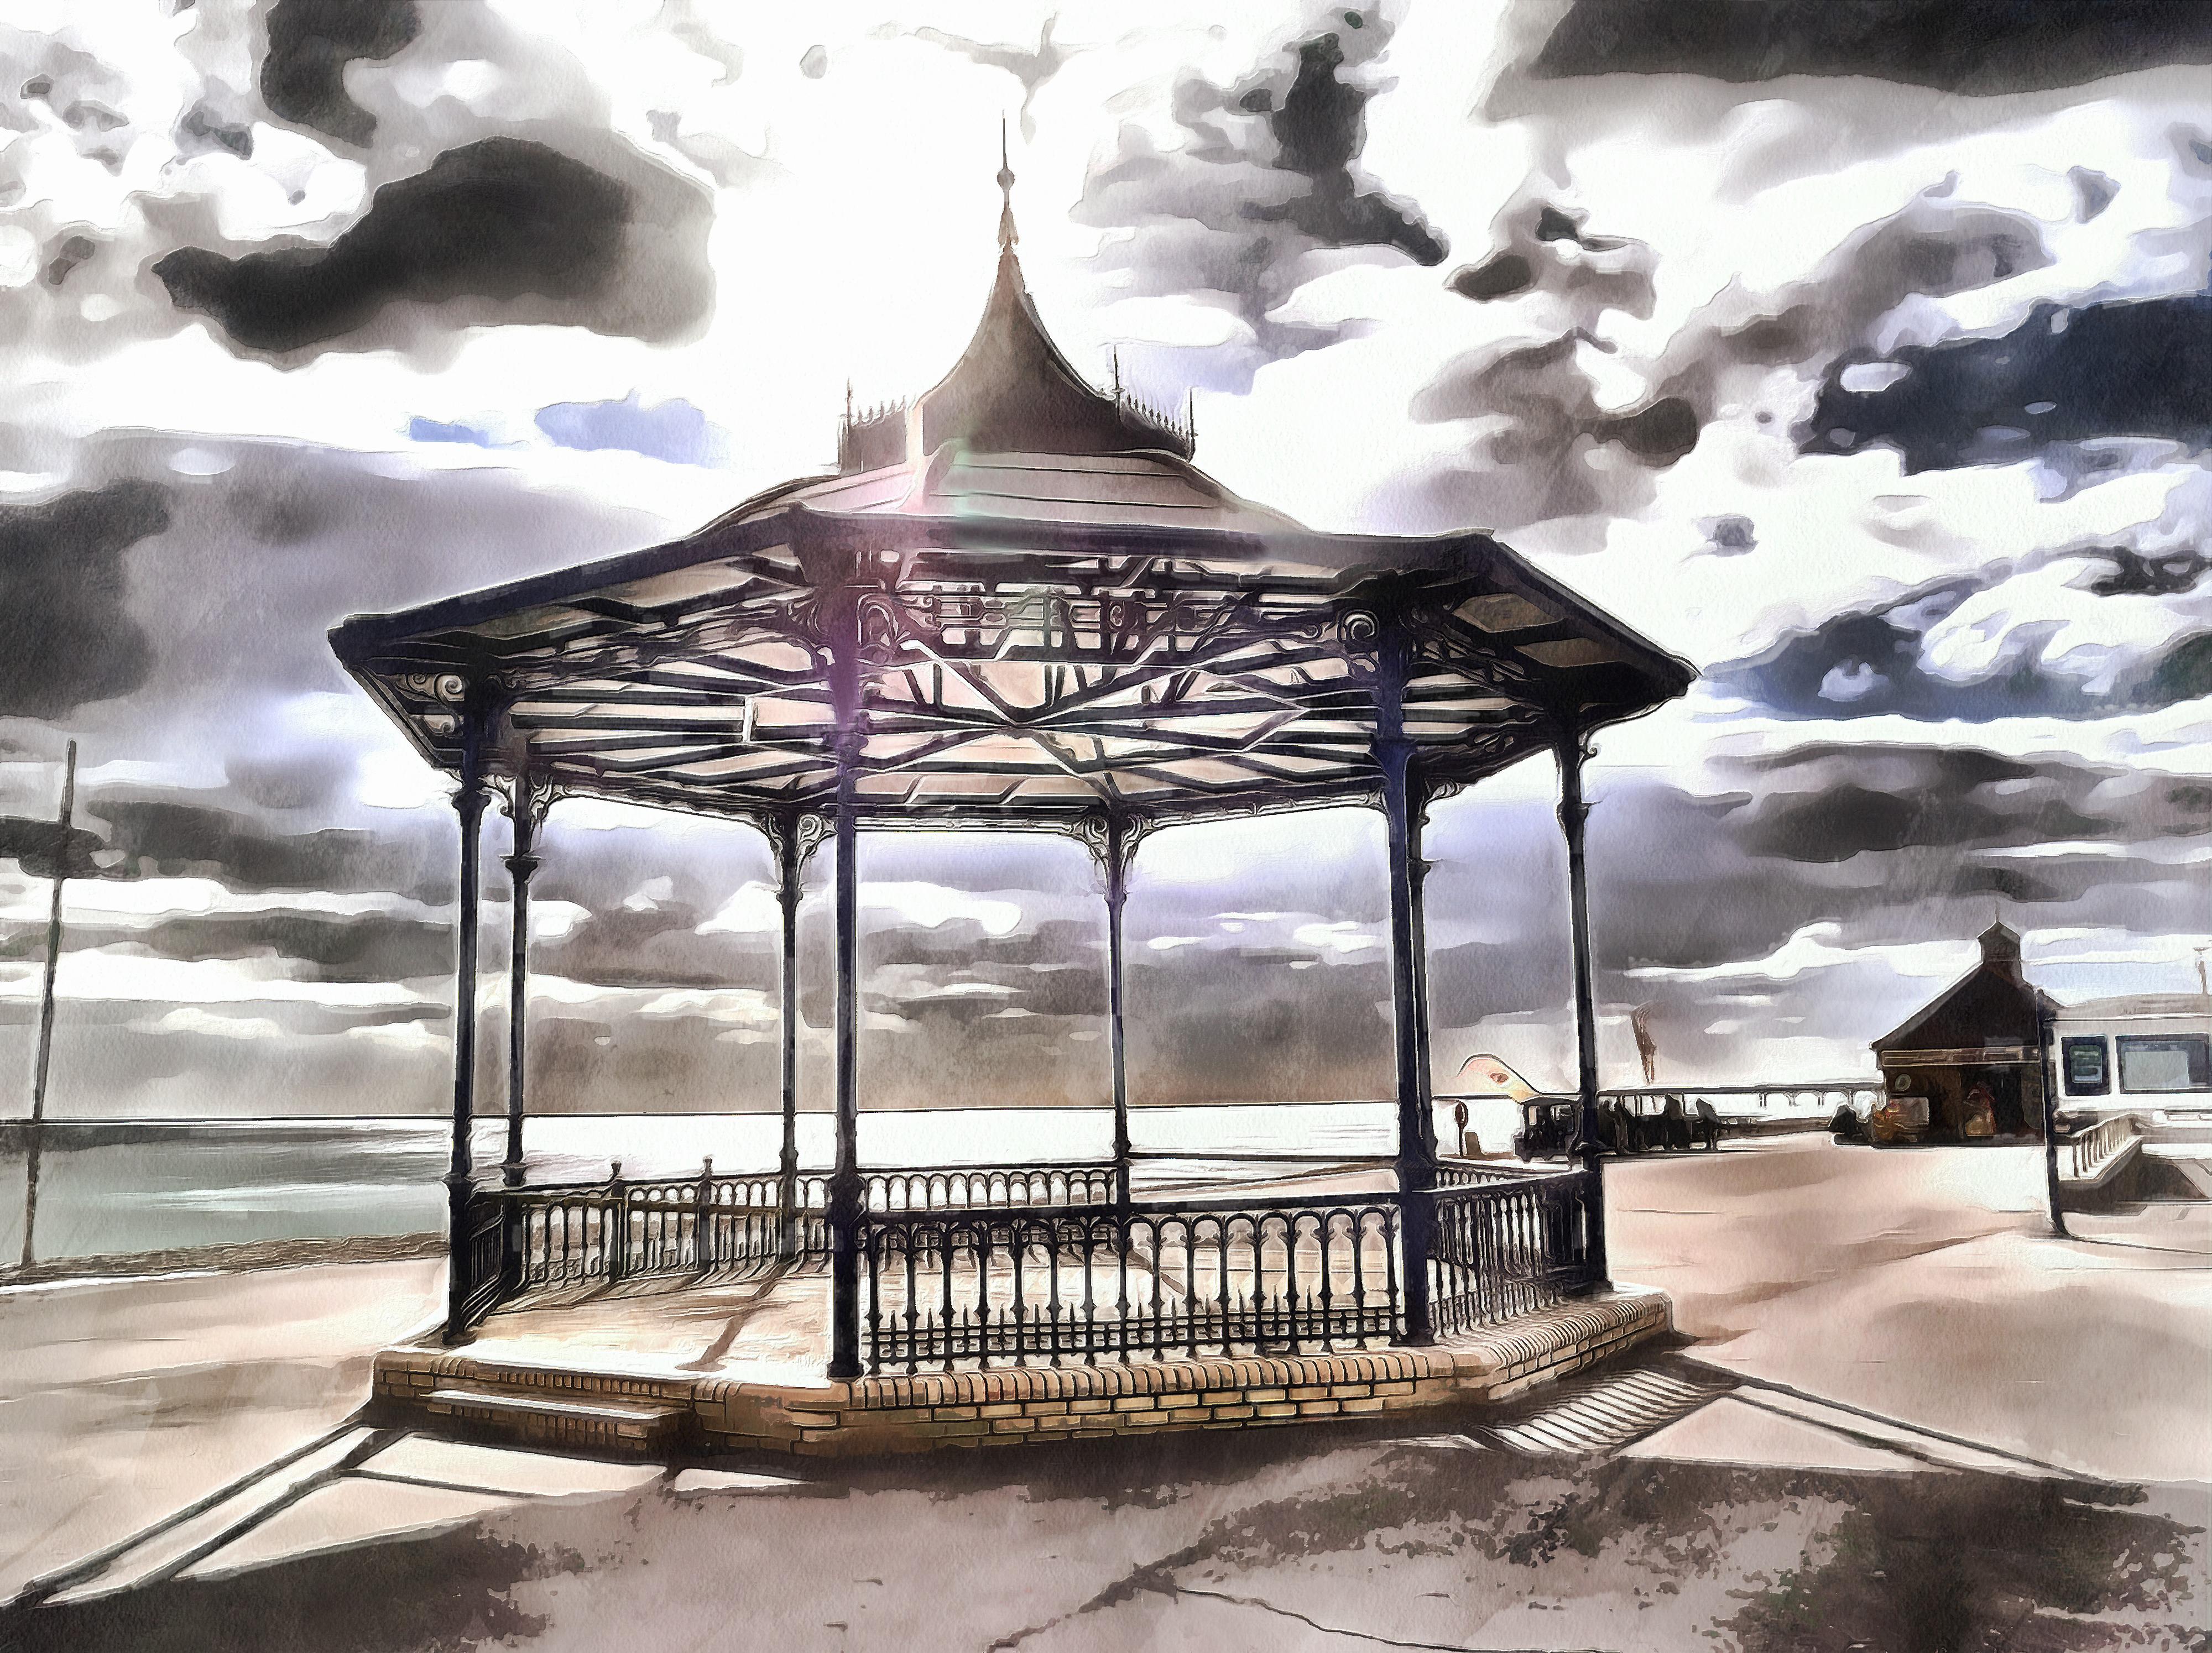 Bognor Regis Bandstand